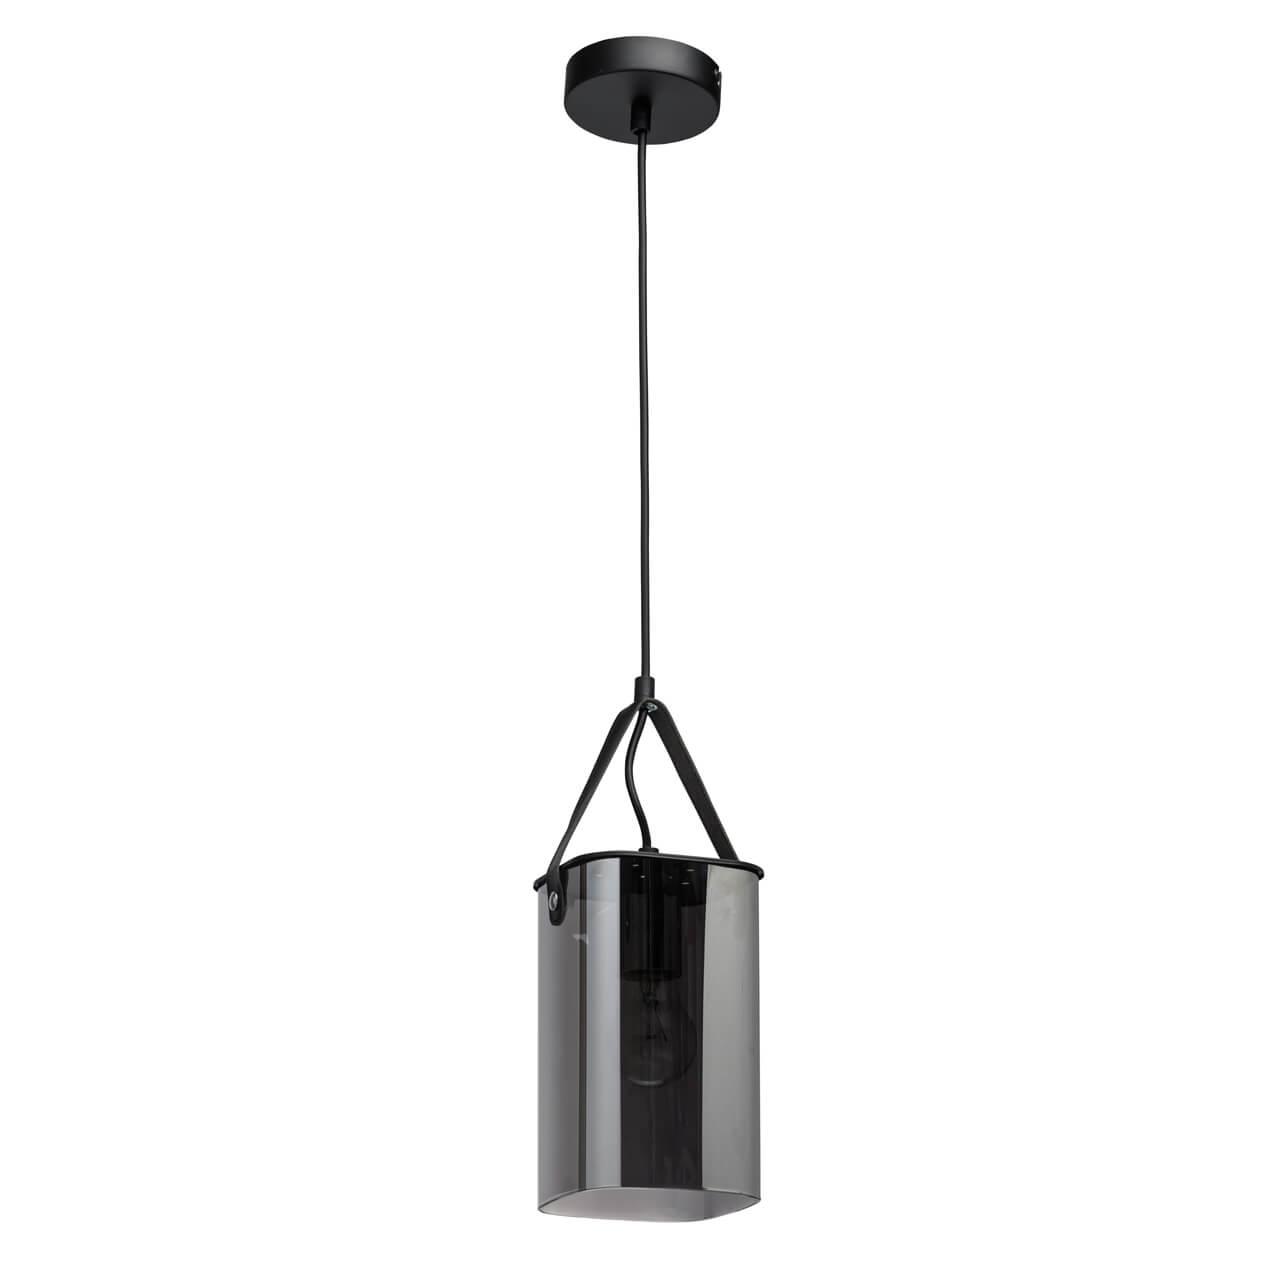 Светильник De Markt 673015701 Тетро